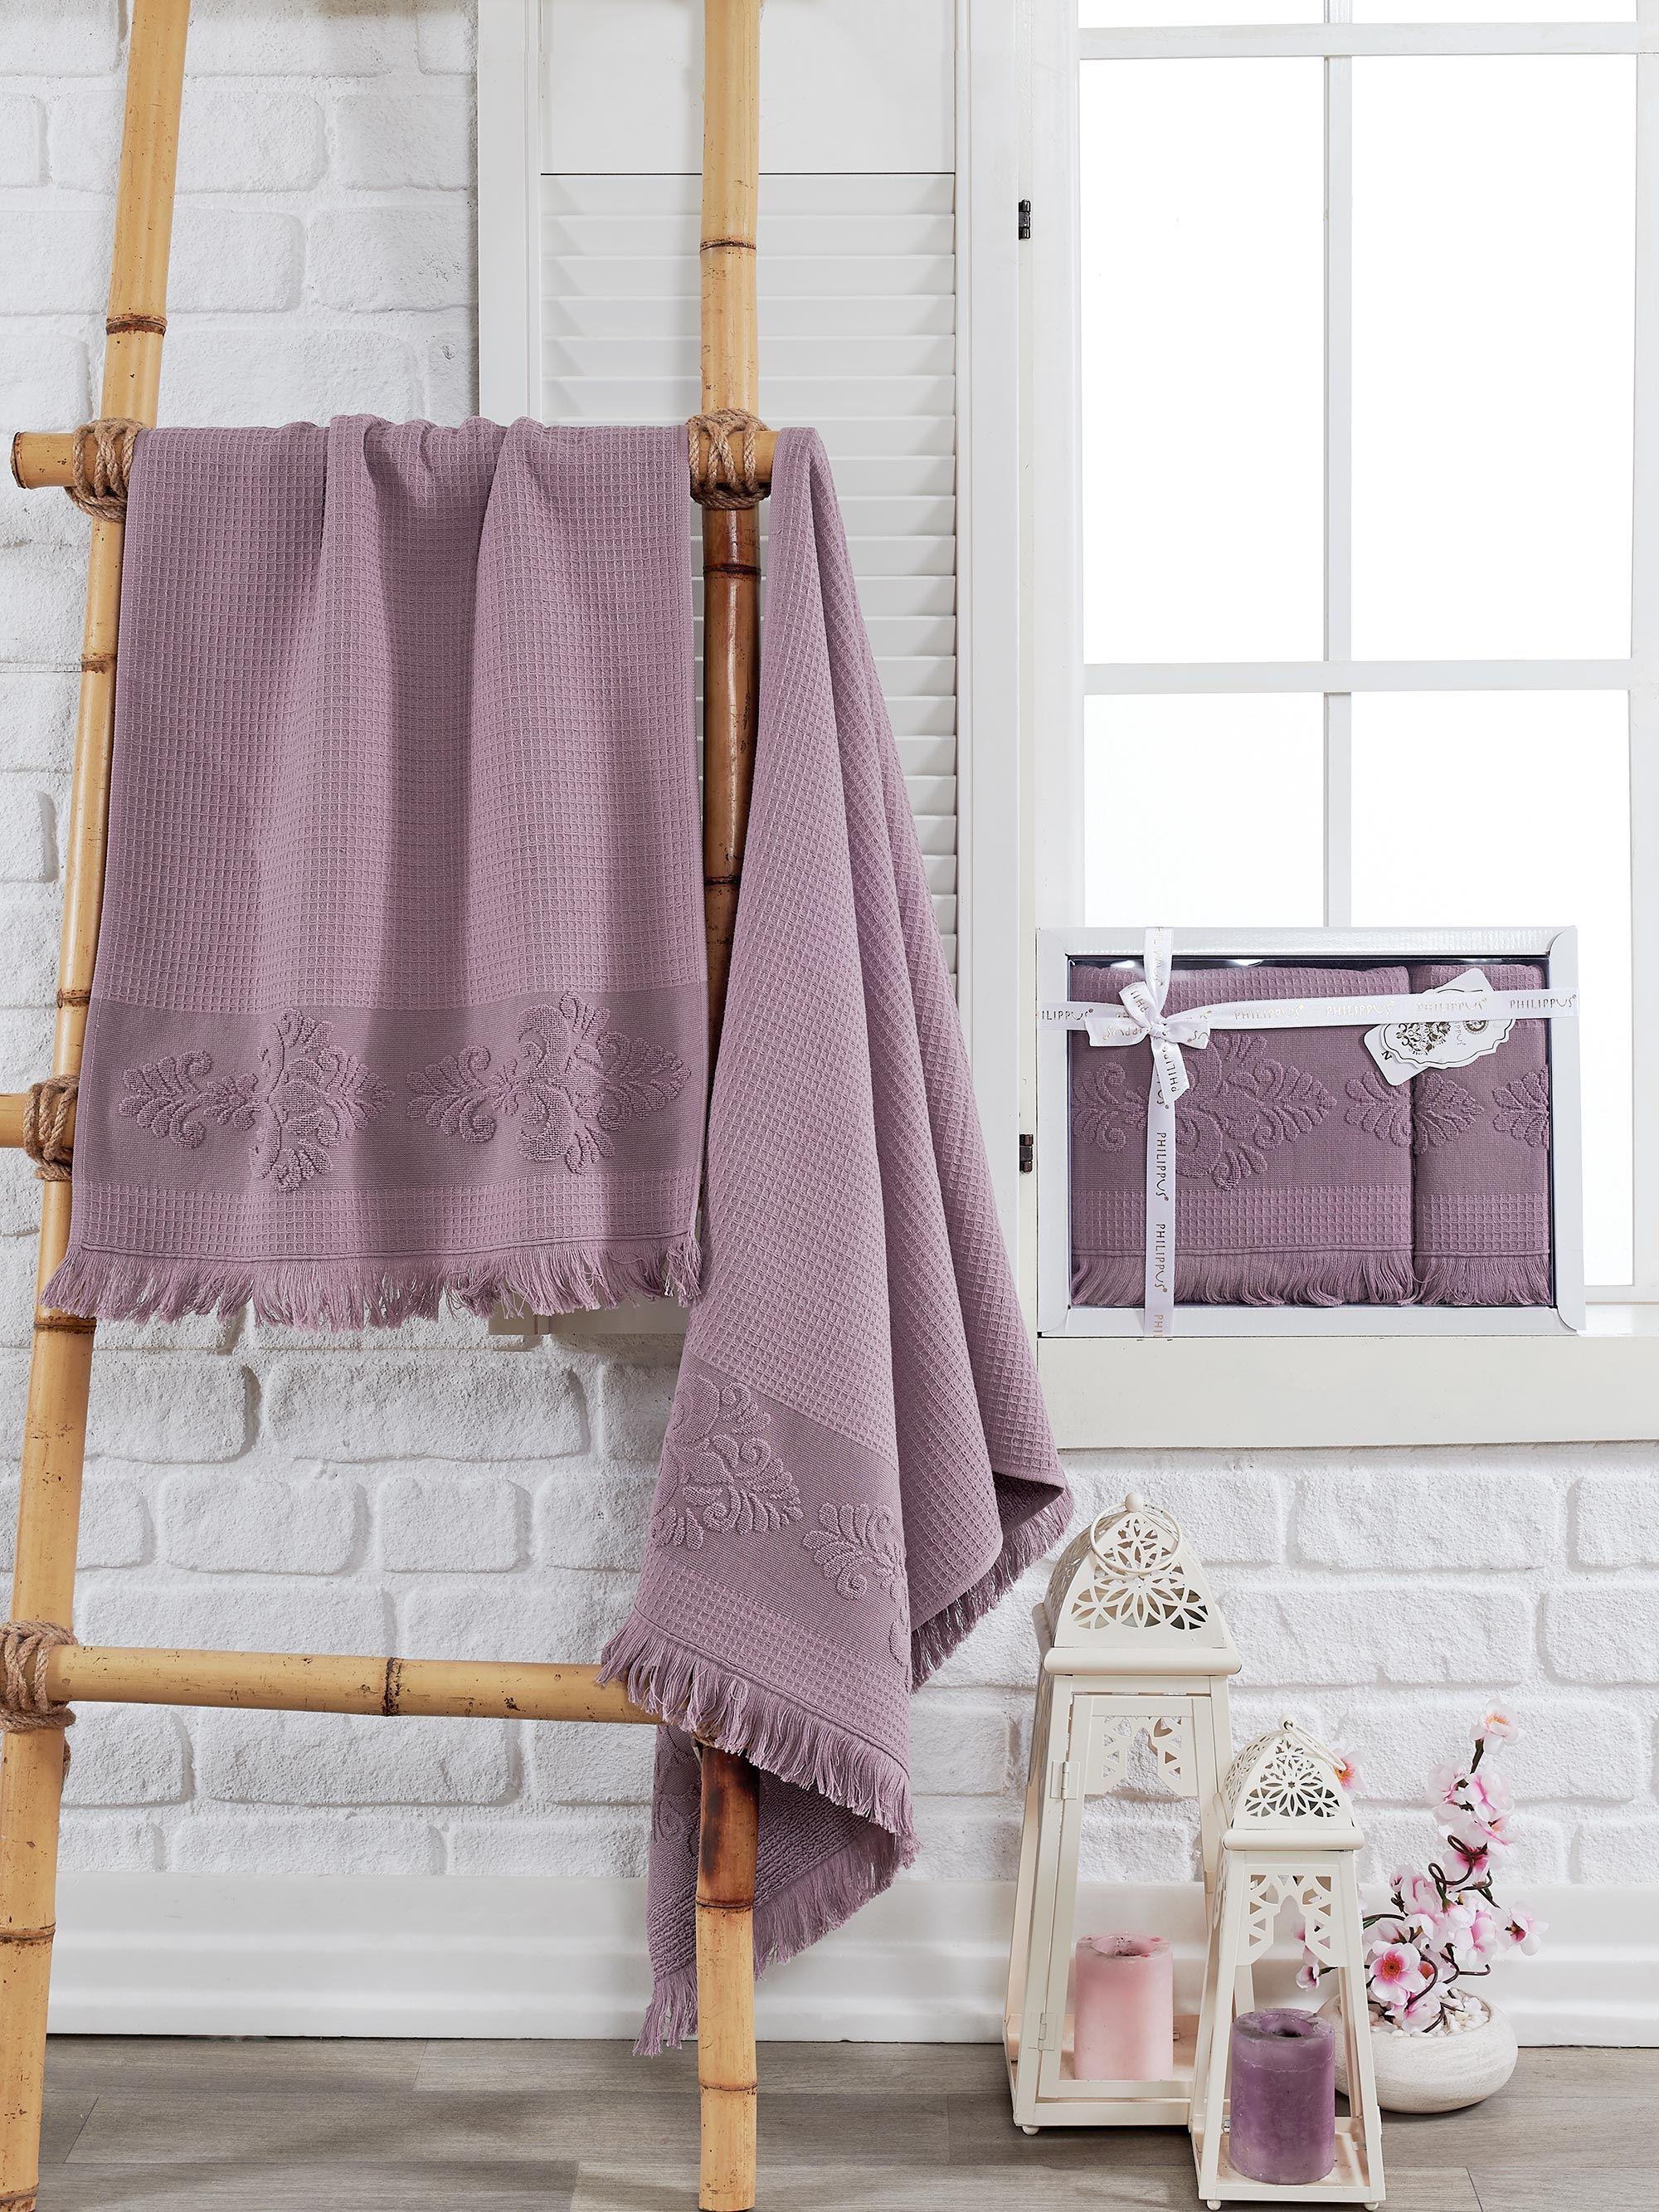 Полотенца Philippus Полотенце Ahus Цвет: Баклажан (50х90 см,70х140 см) полотенца philippus полотенце maura цвет кремовый 50х90 см